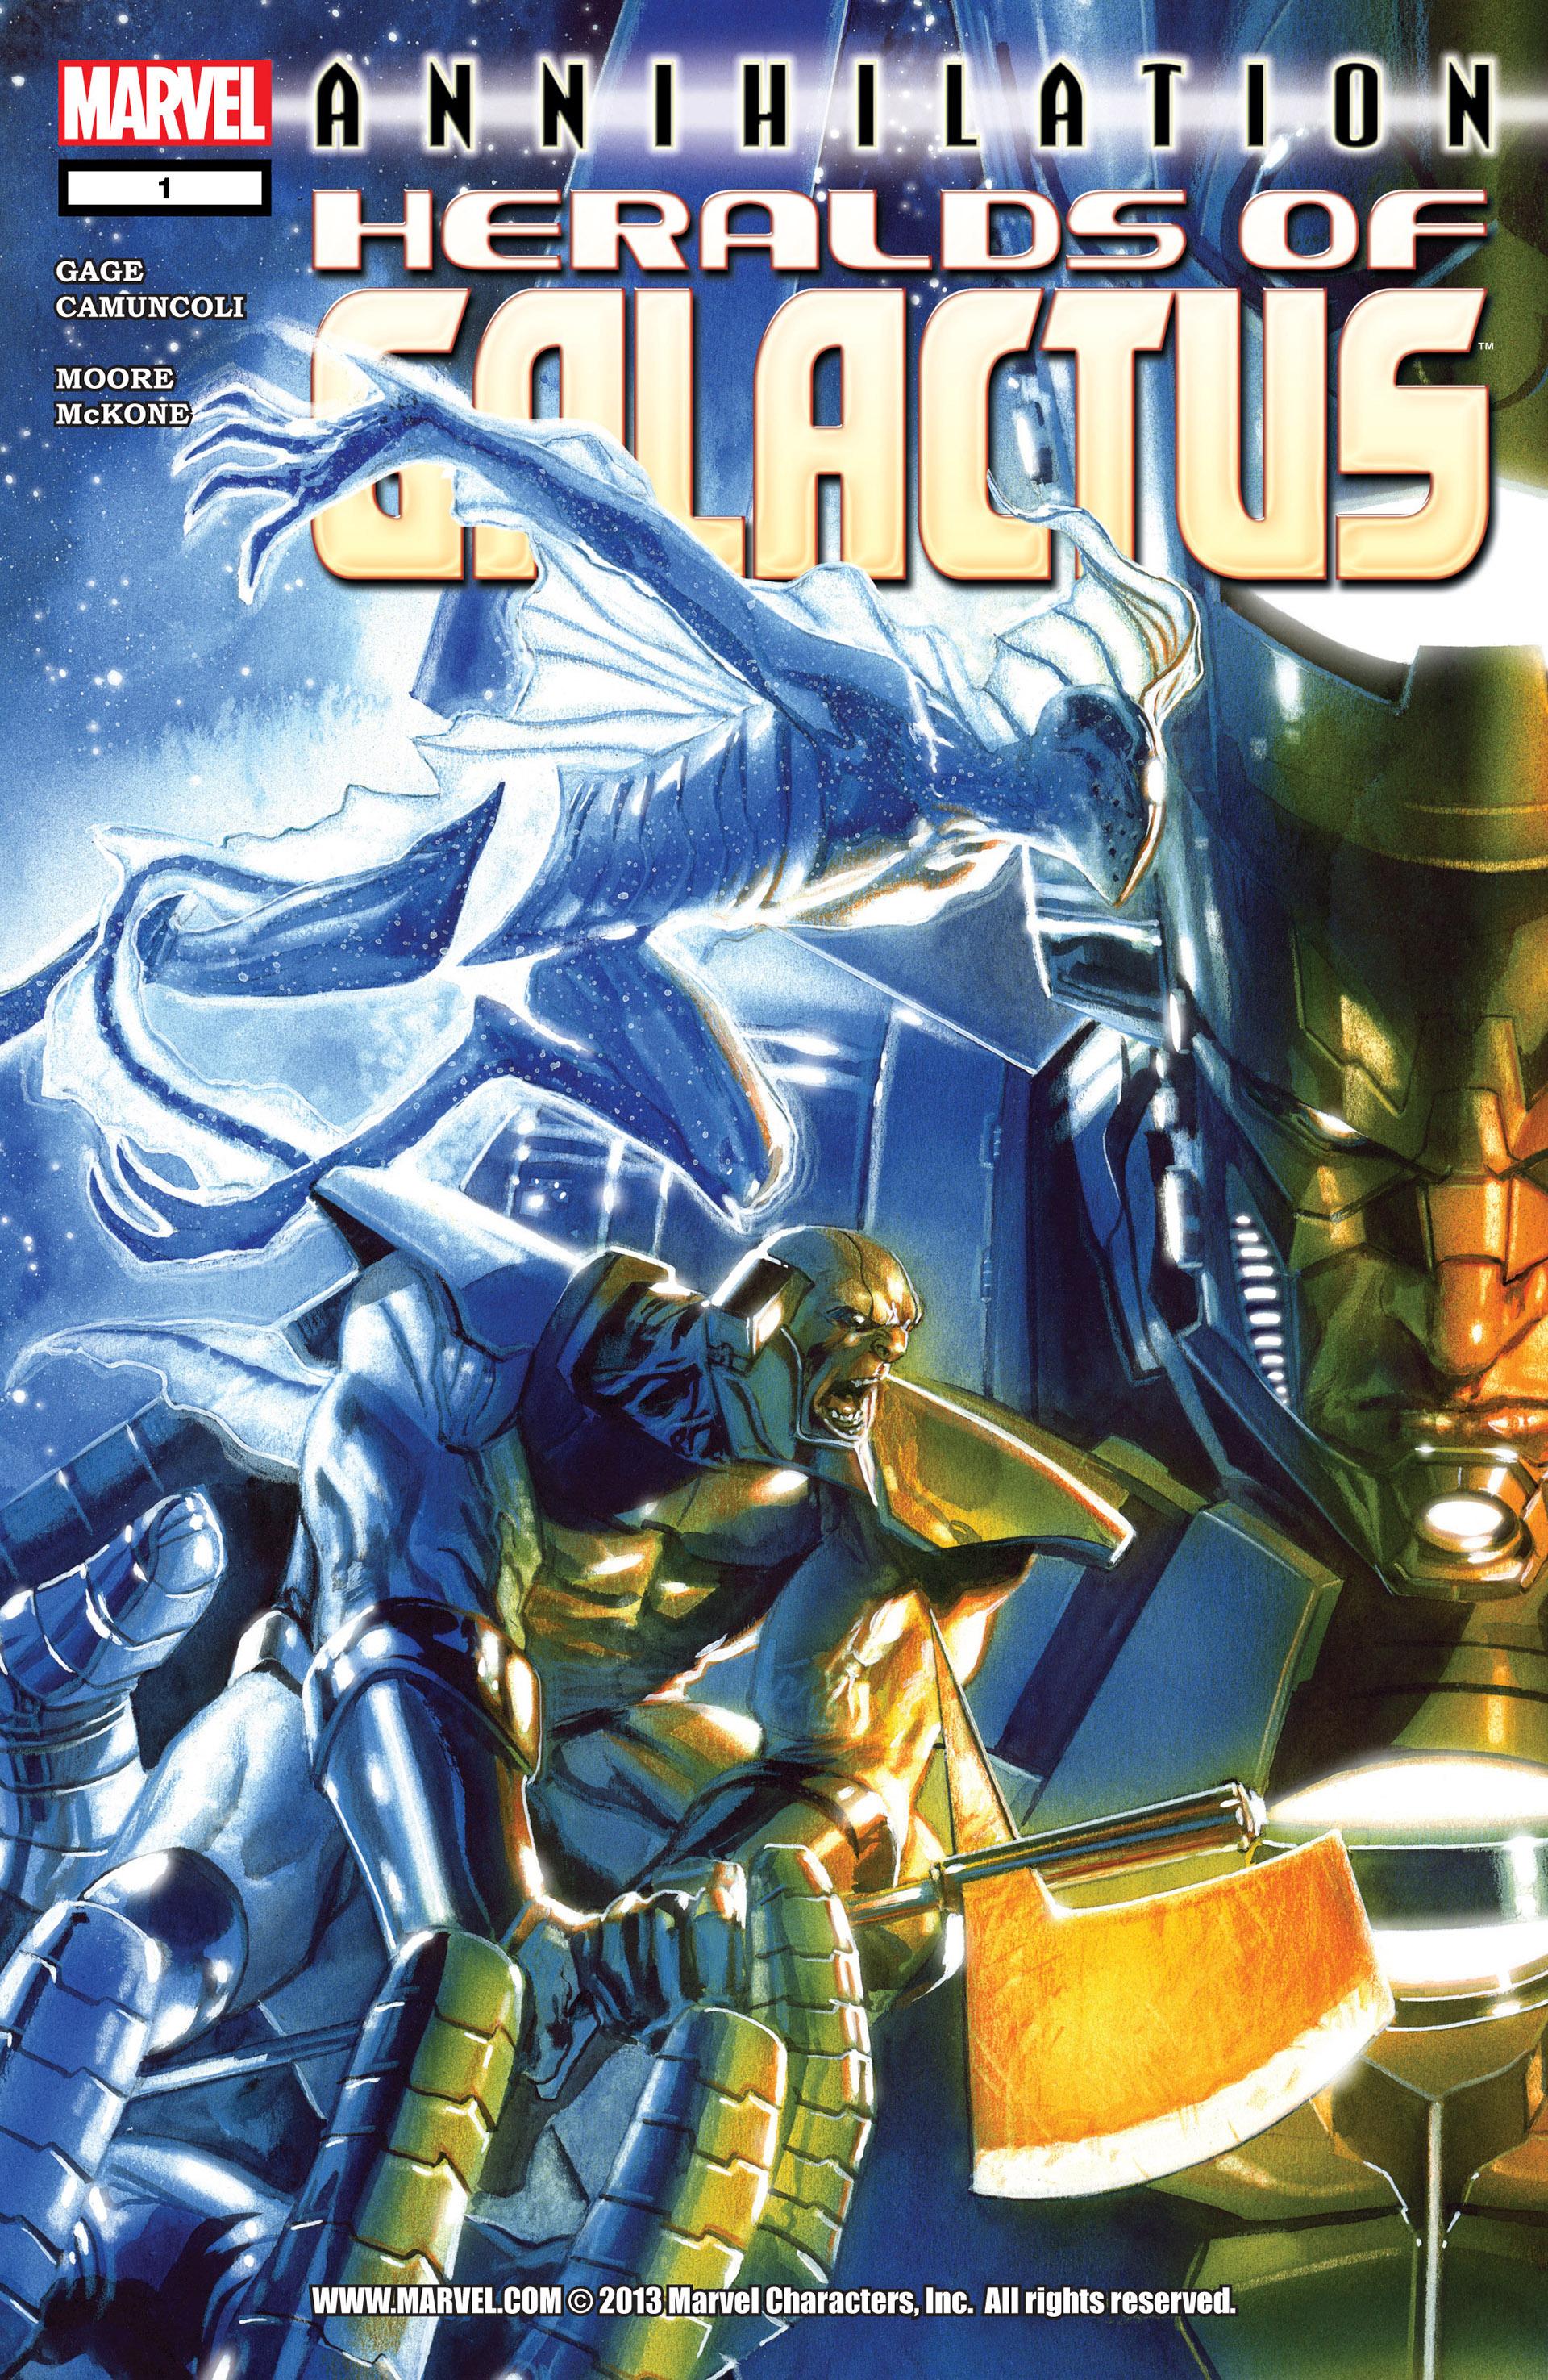 Read online Annihilation: Heralds Of Galactus comic -  Issue #1 - 1